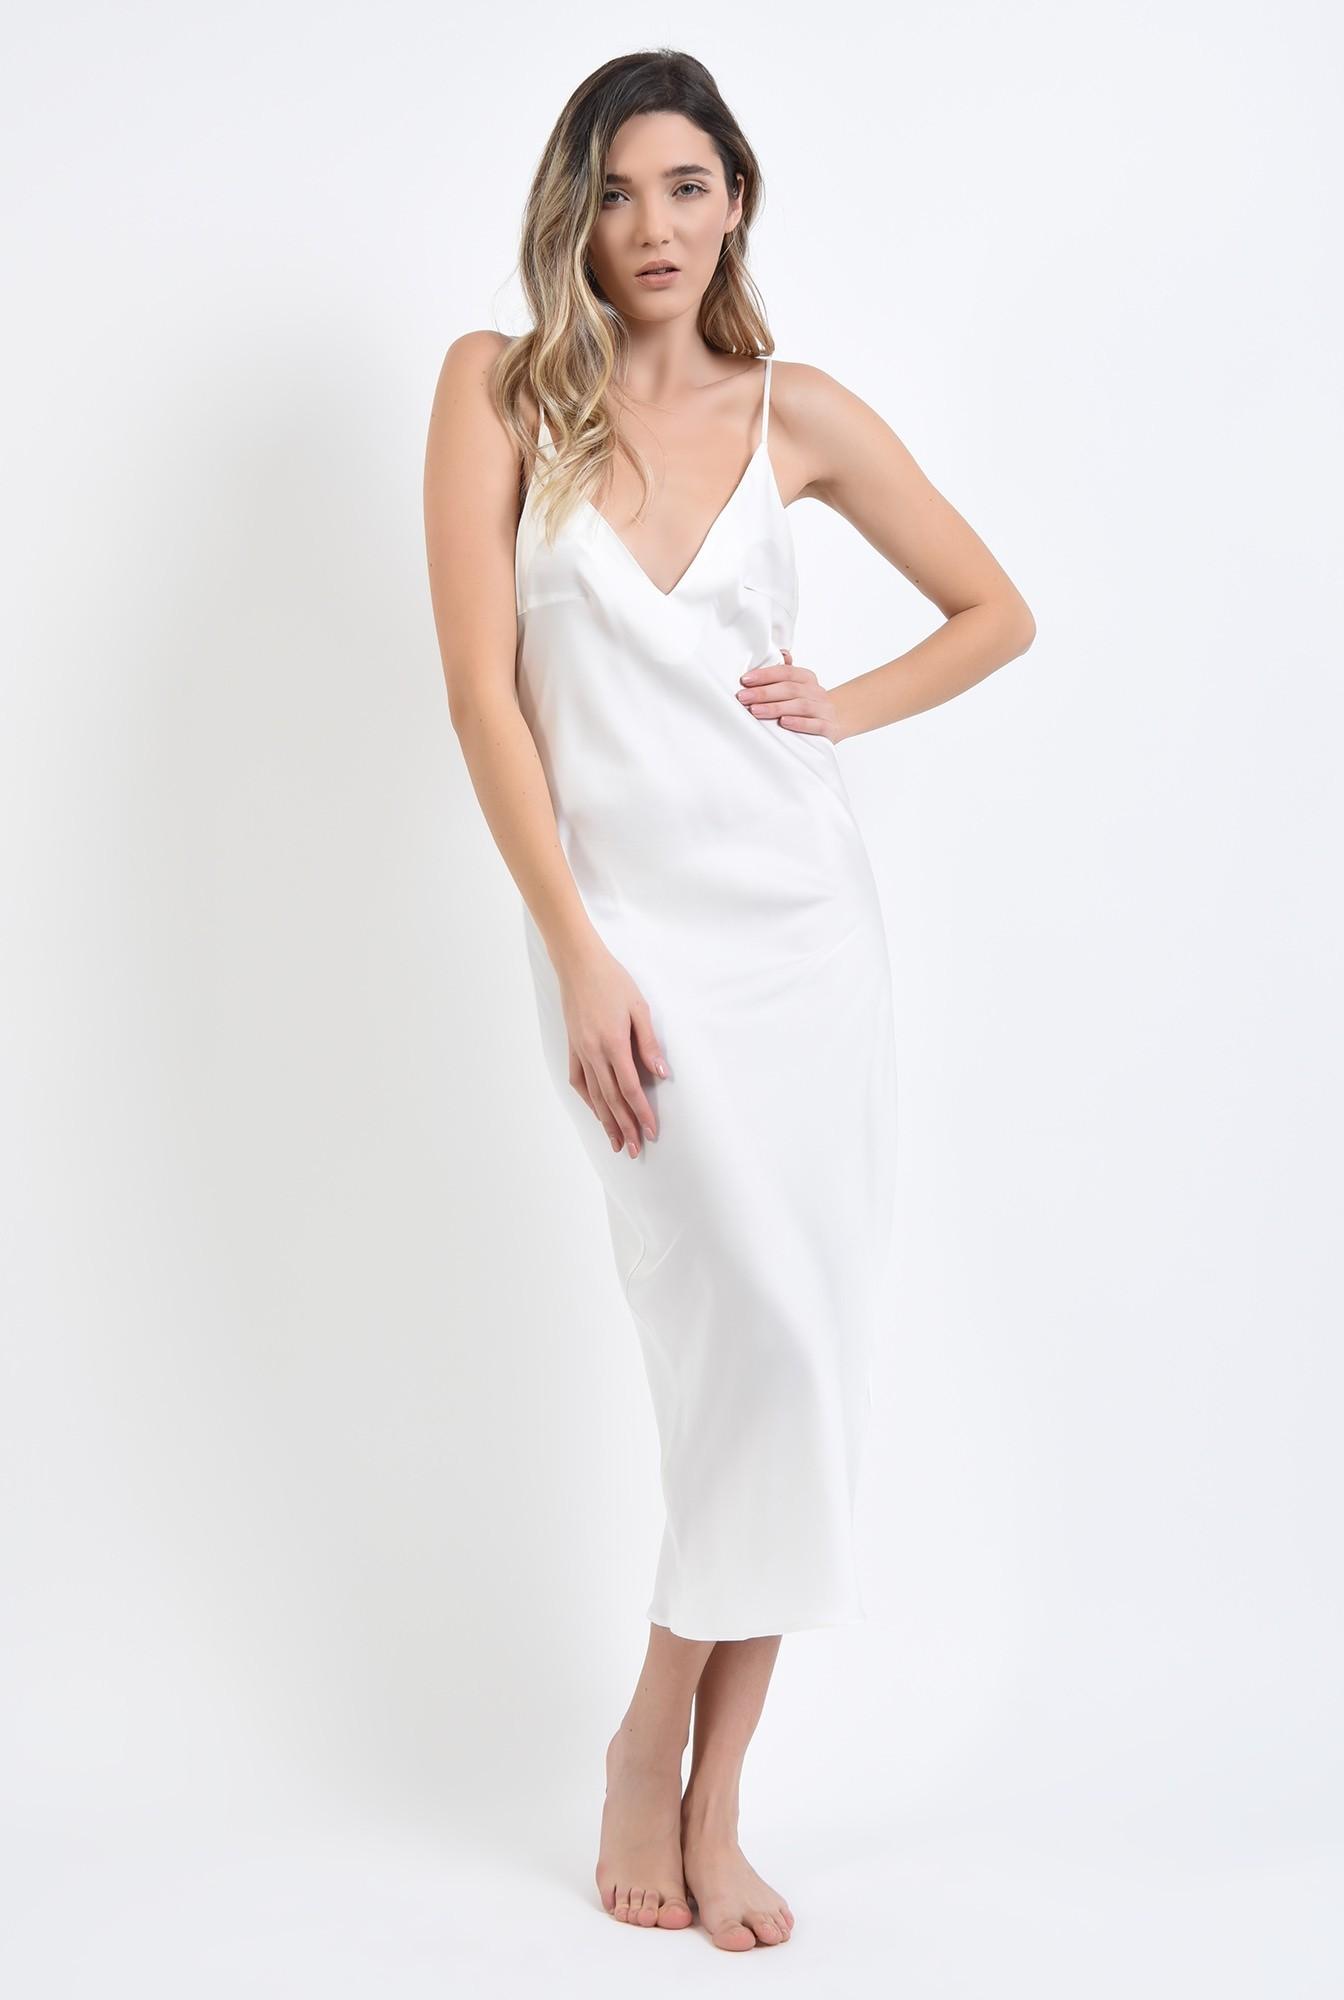 1 - rochie alba, din satin, cu bretele subtiri